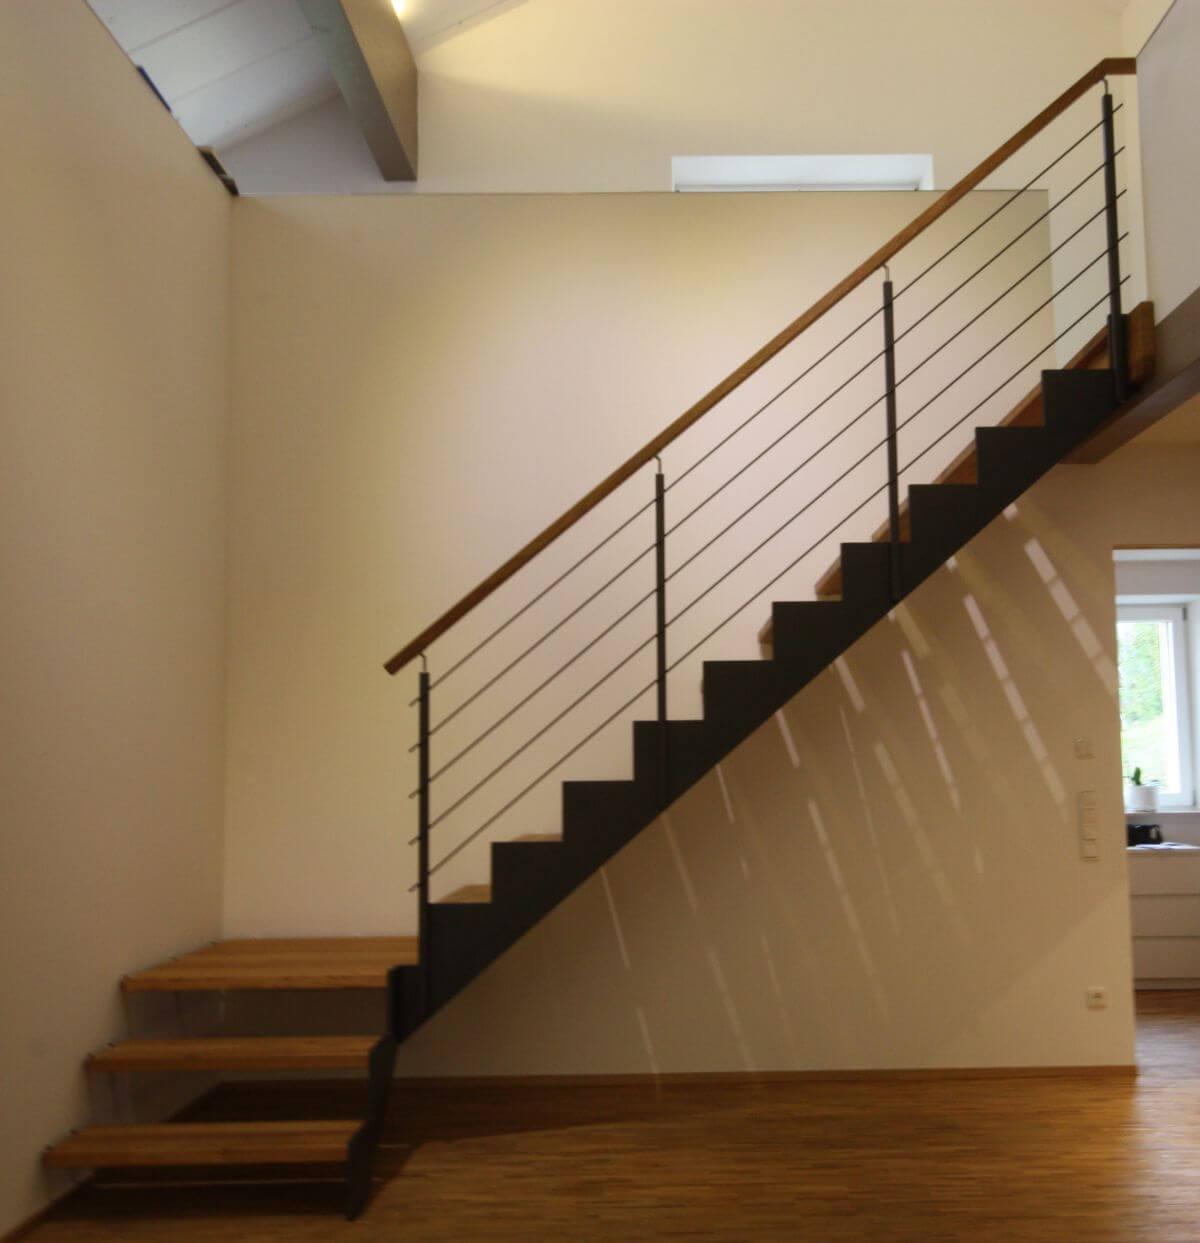 galerie stahlwangentreppe ferro friedrich treppenbau. Black Bedroom Furniture Sets. Home Design Ideas